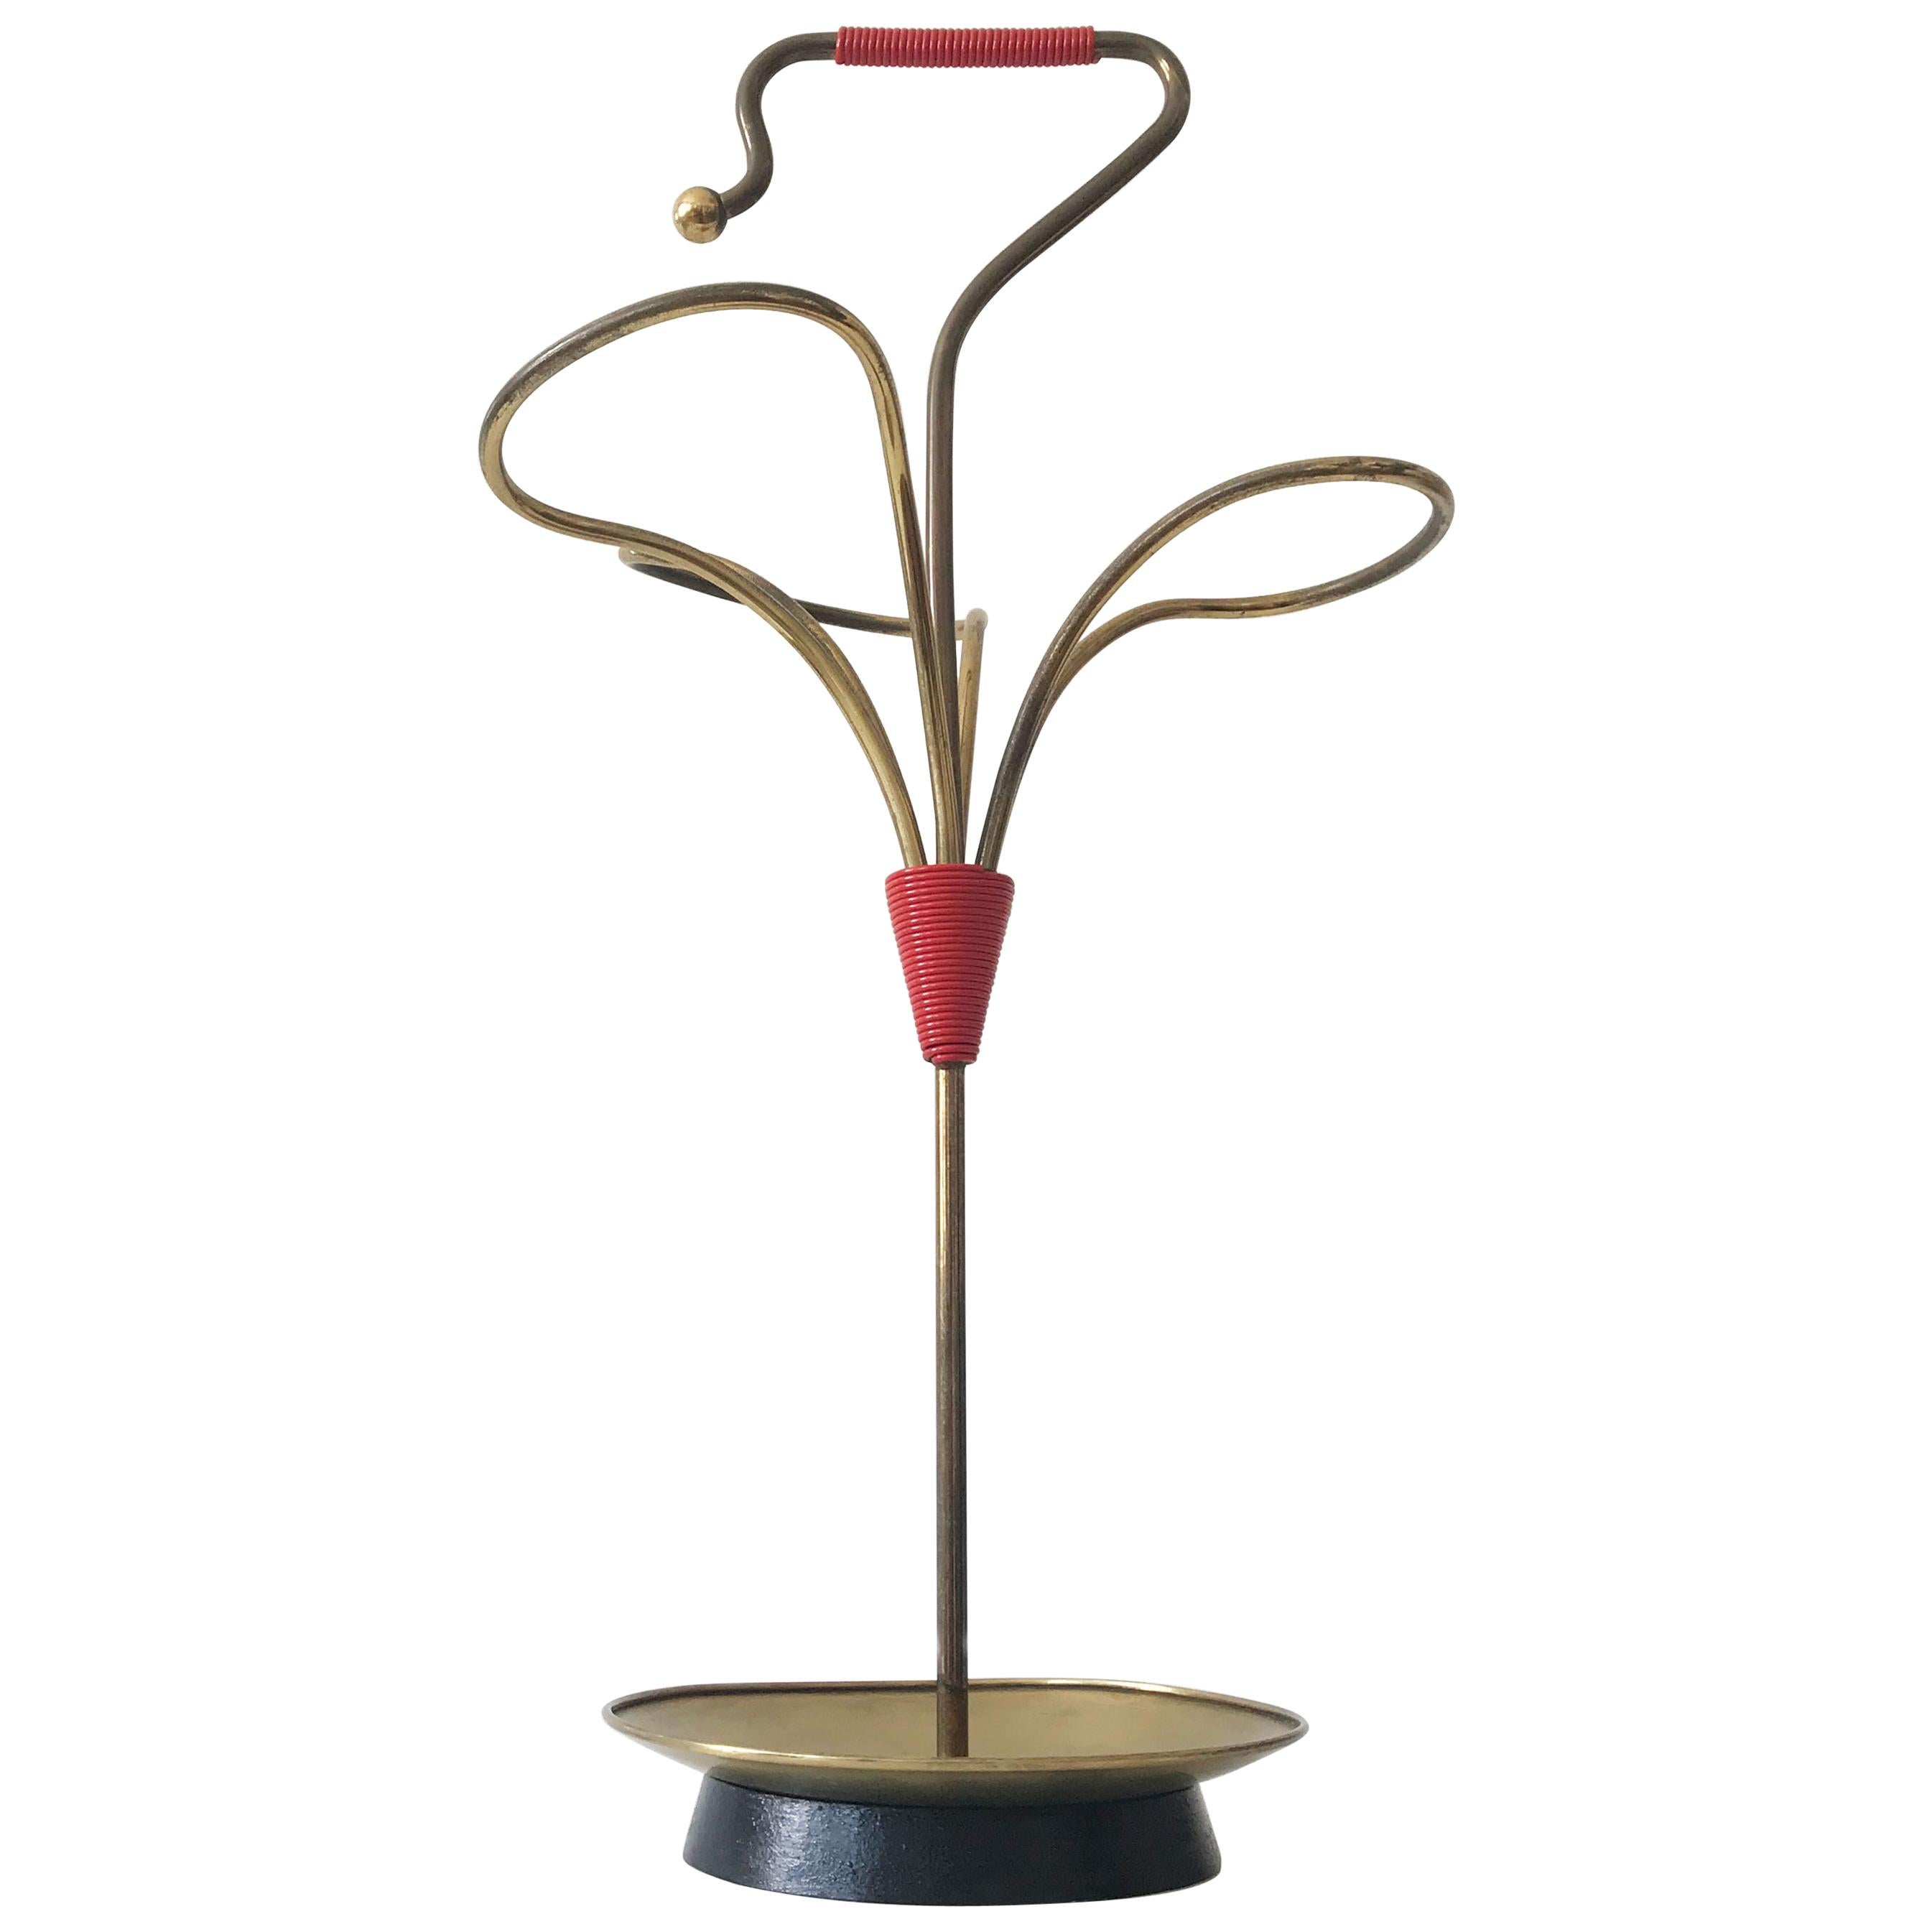 Lovely Mid-Century Modern Brass Umbrella Stand, 1950s, Austria